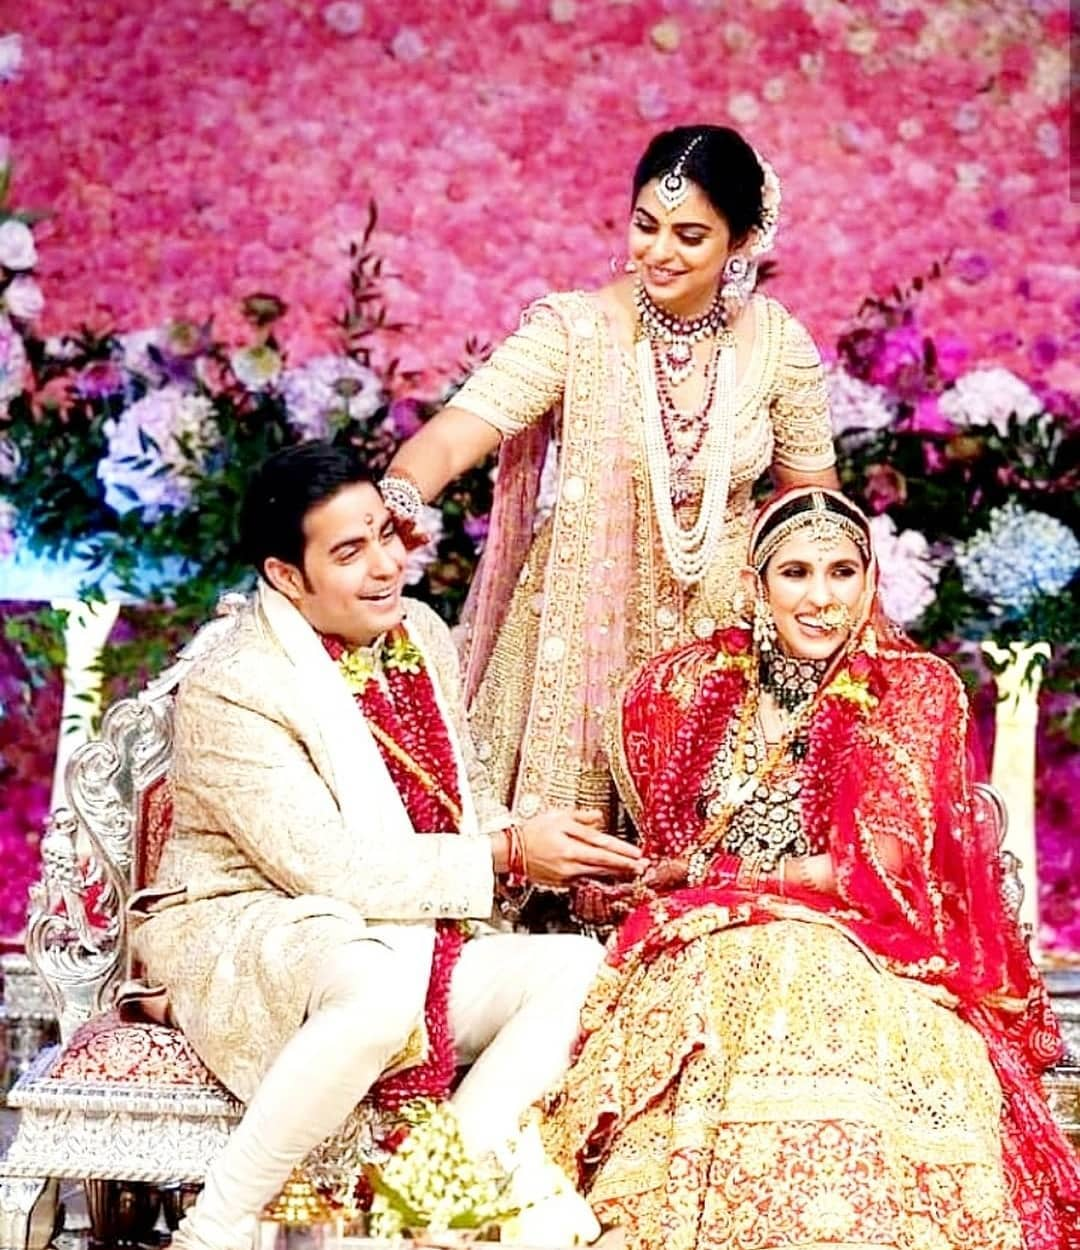 Shloka Mehta and Akash Ambani's wedding